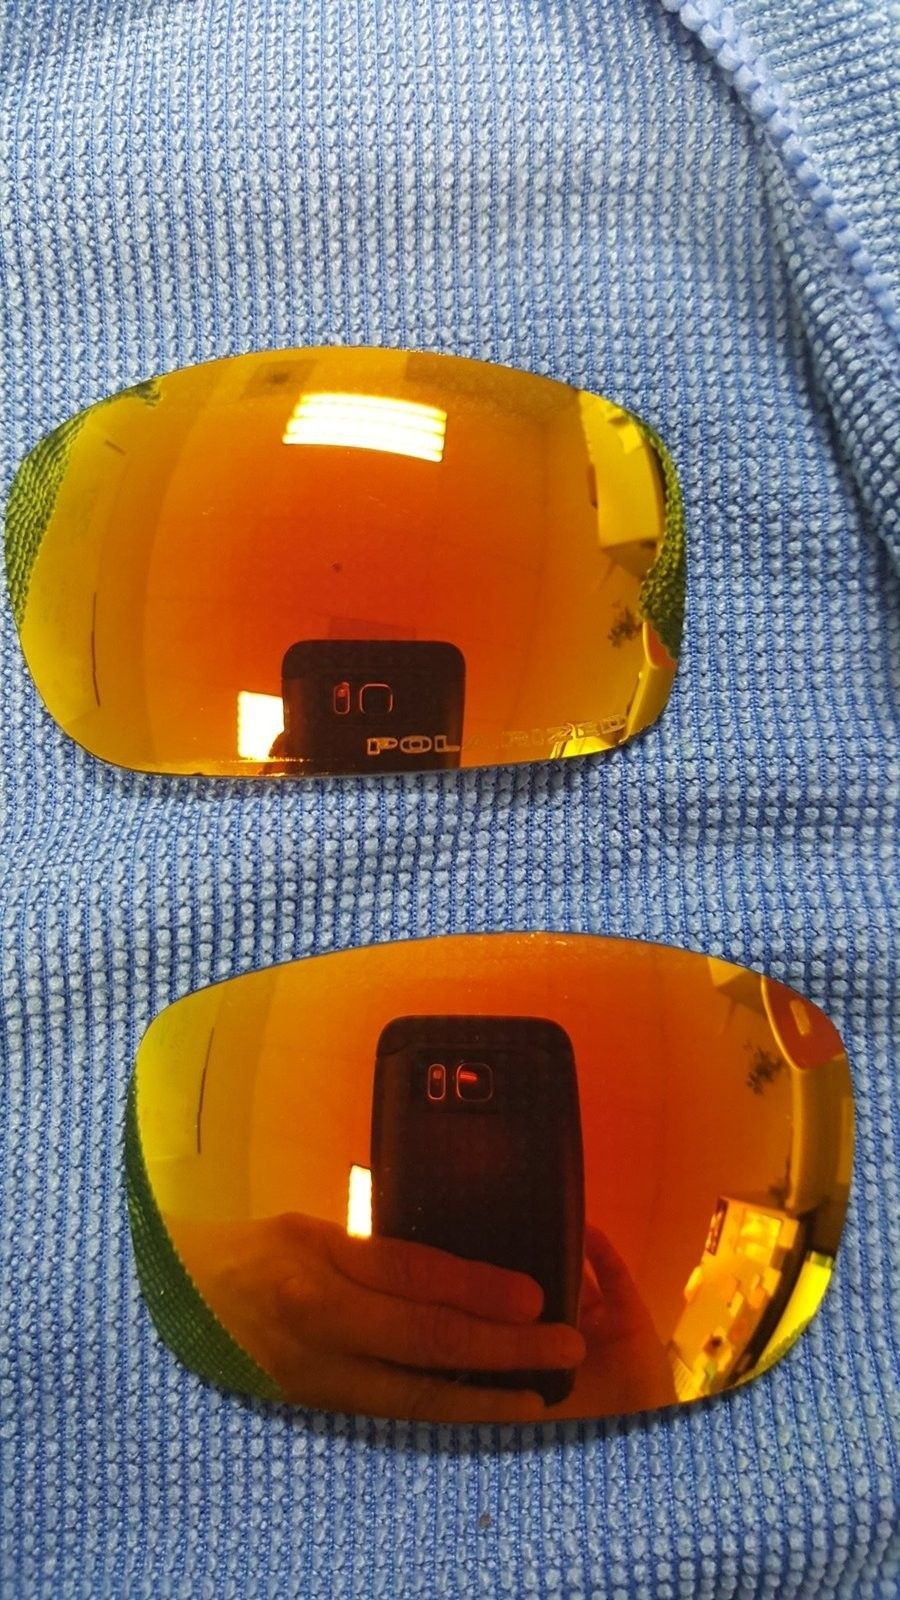 Like New - Xm X Squared +Xmas Bonus Lenses- 475.00 Shipped/All - 20151209_093654.jpg